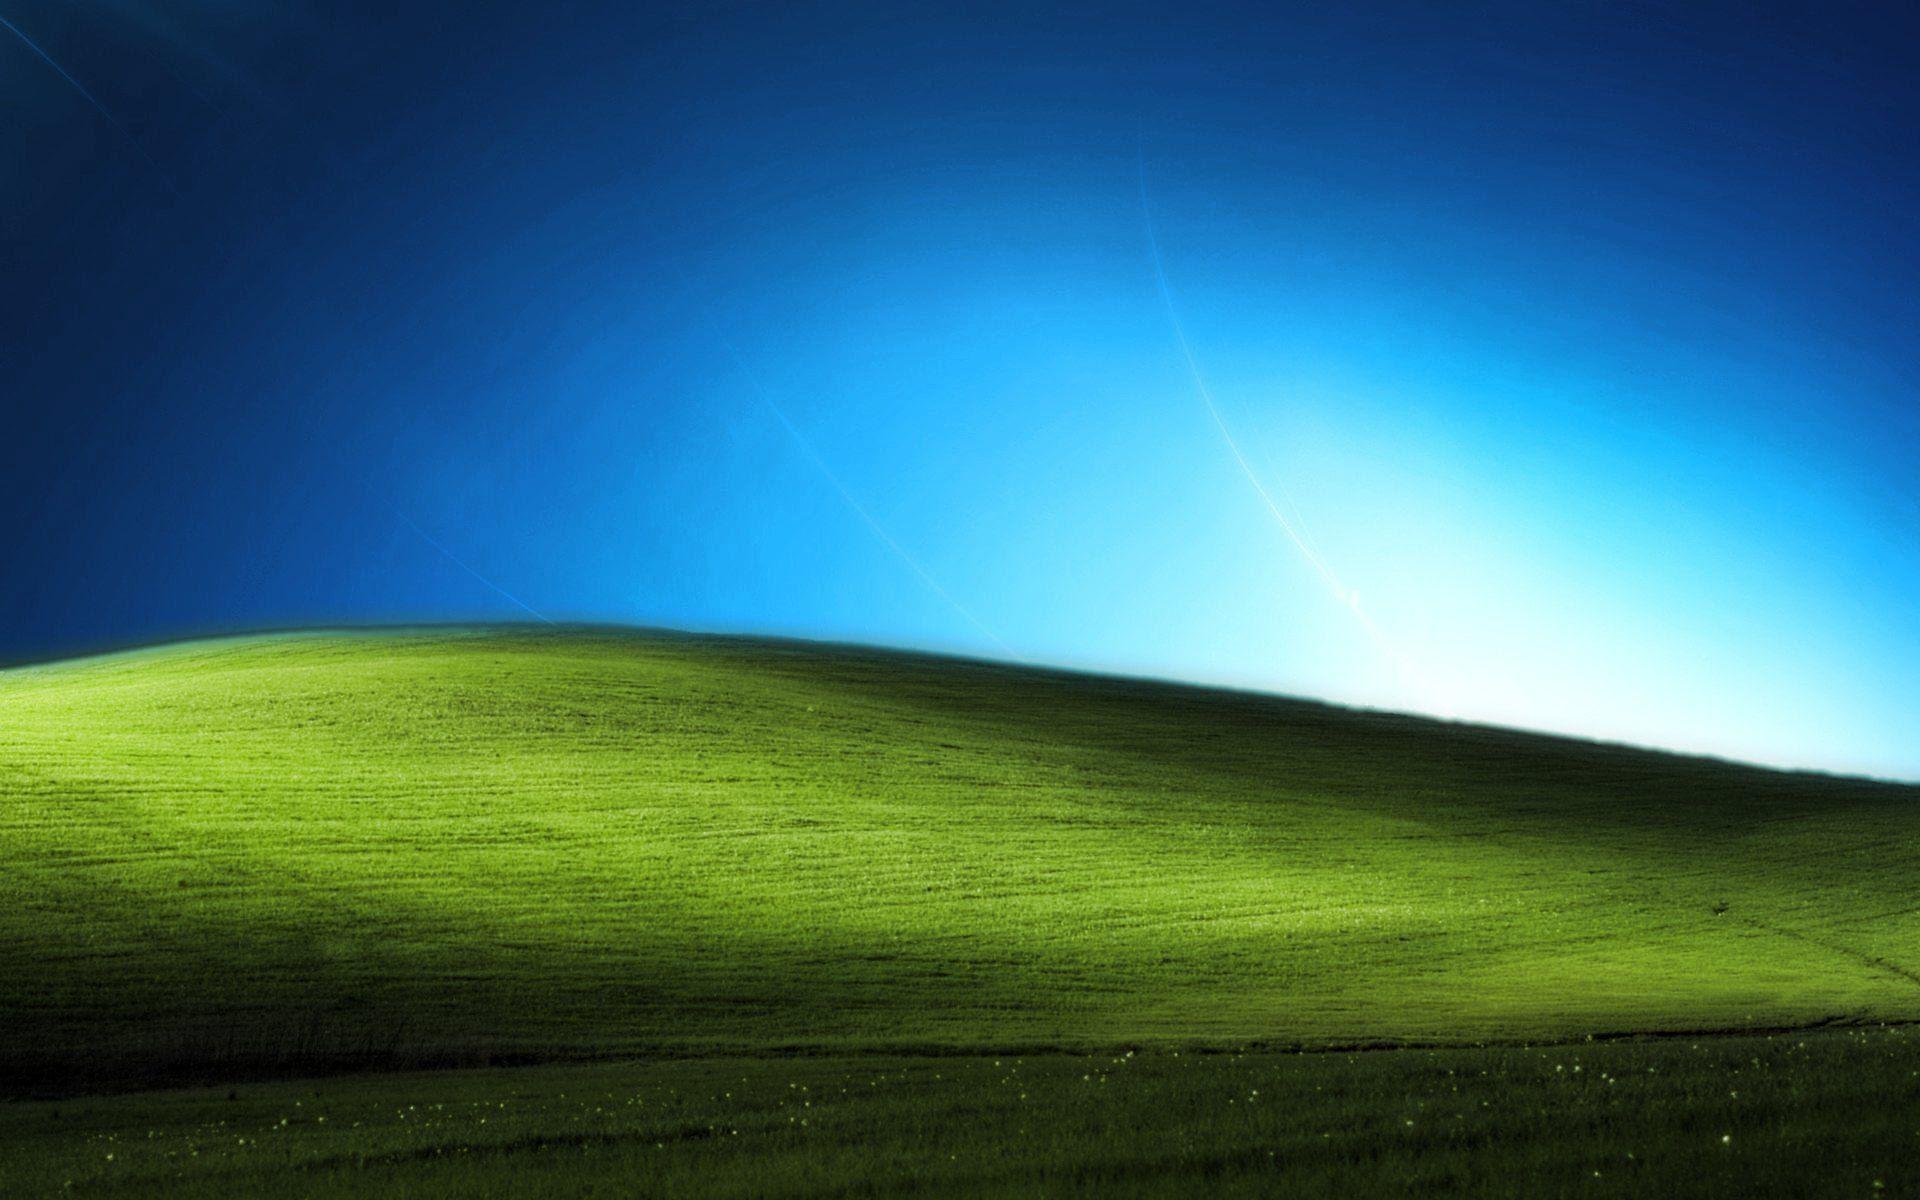 Windows Xp Wallpaper Hd 54 Images